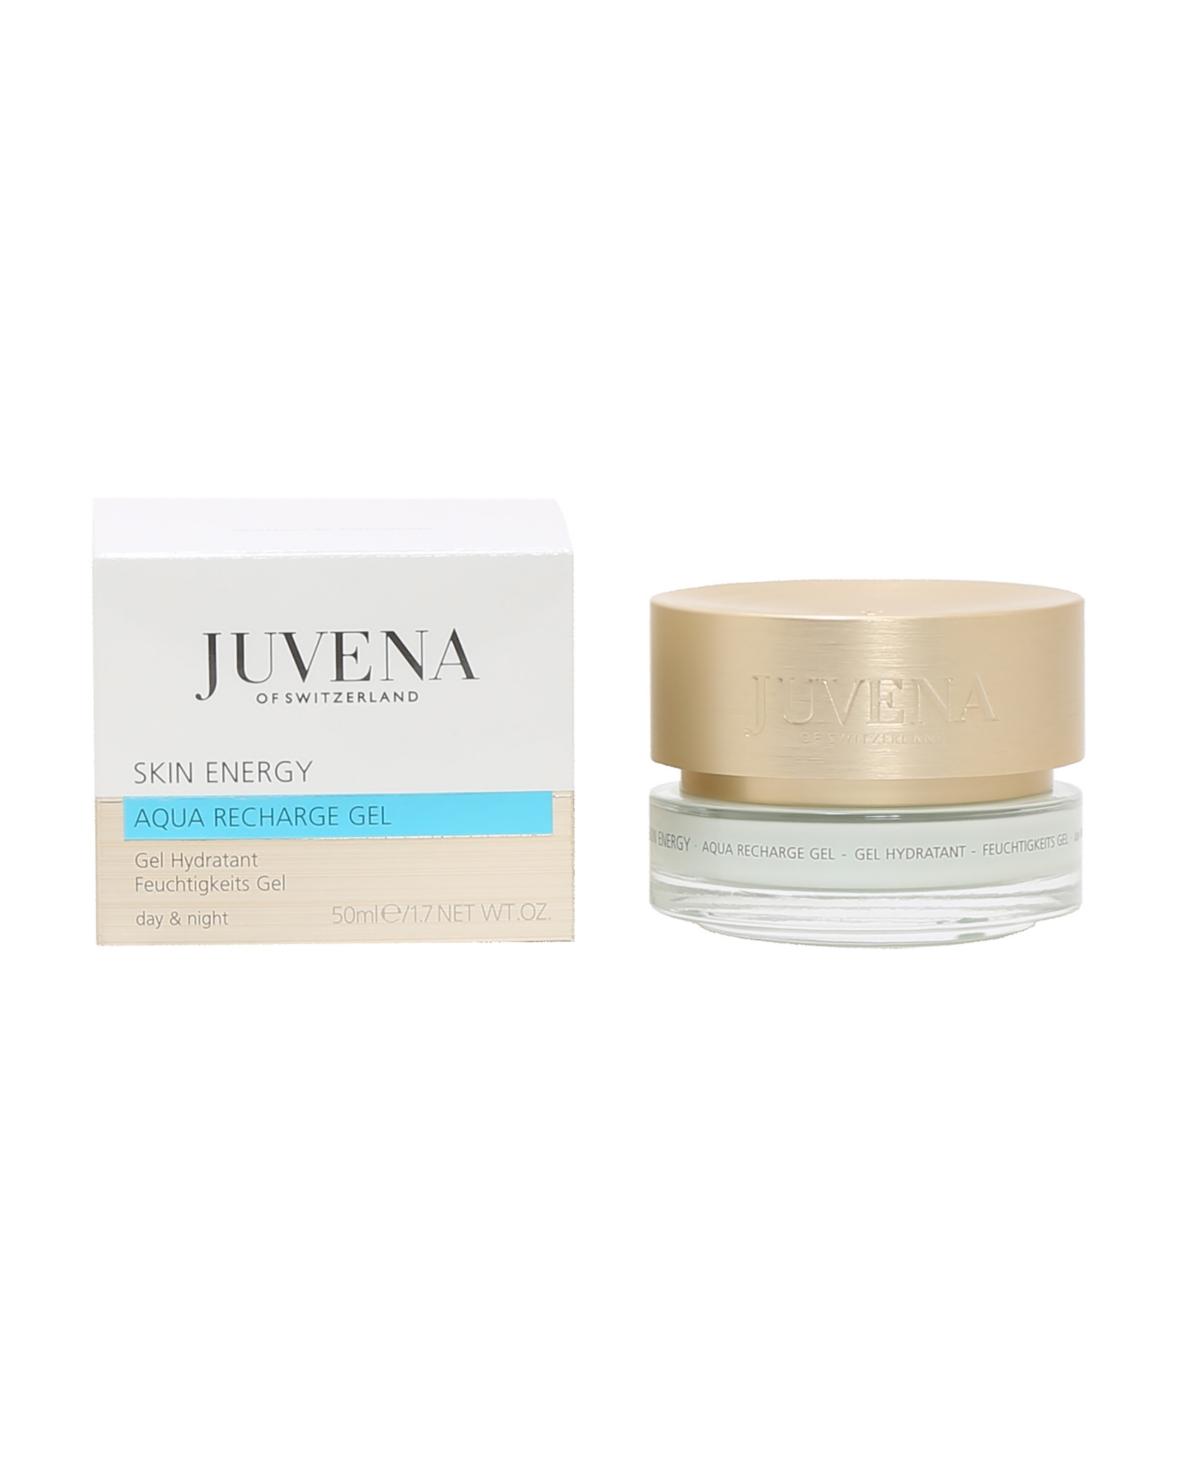 Juvena Skin Energy Aqua Recharge Gel Jar, 1.7 oz